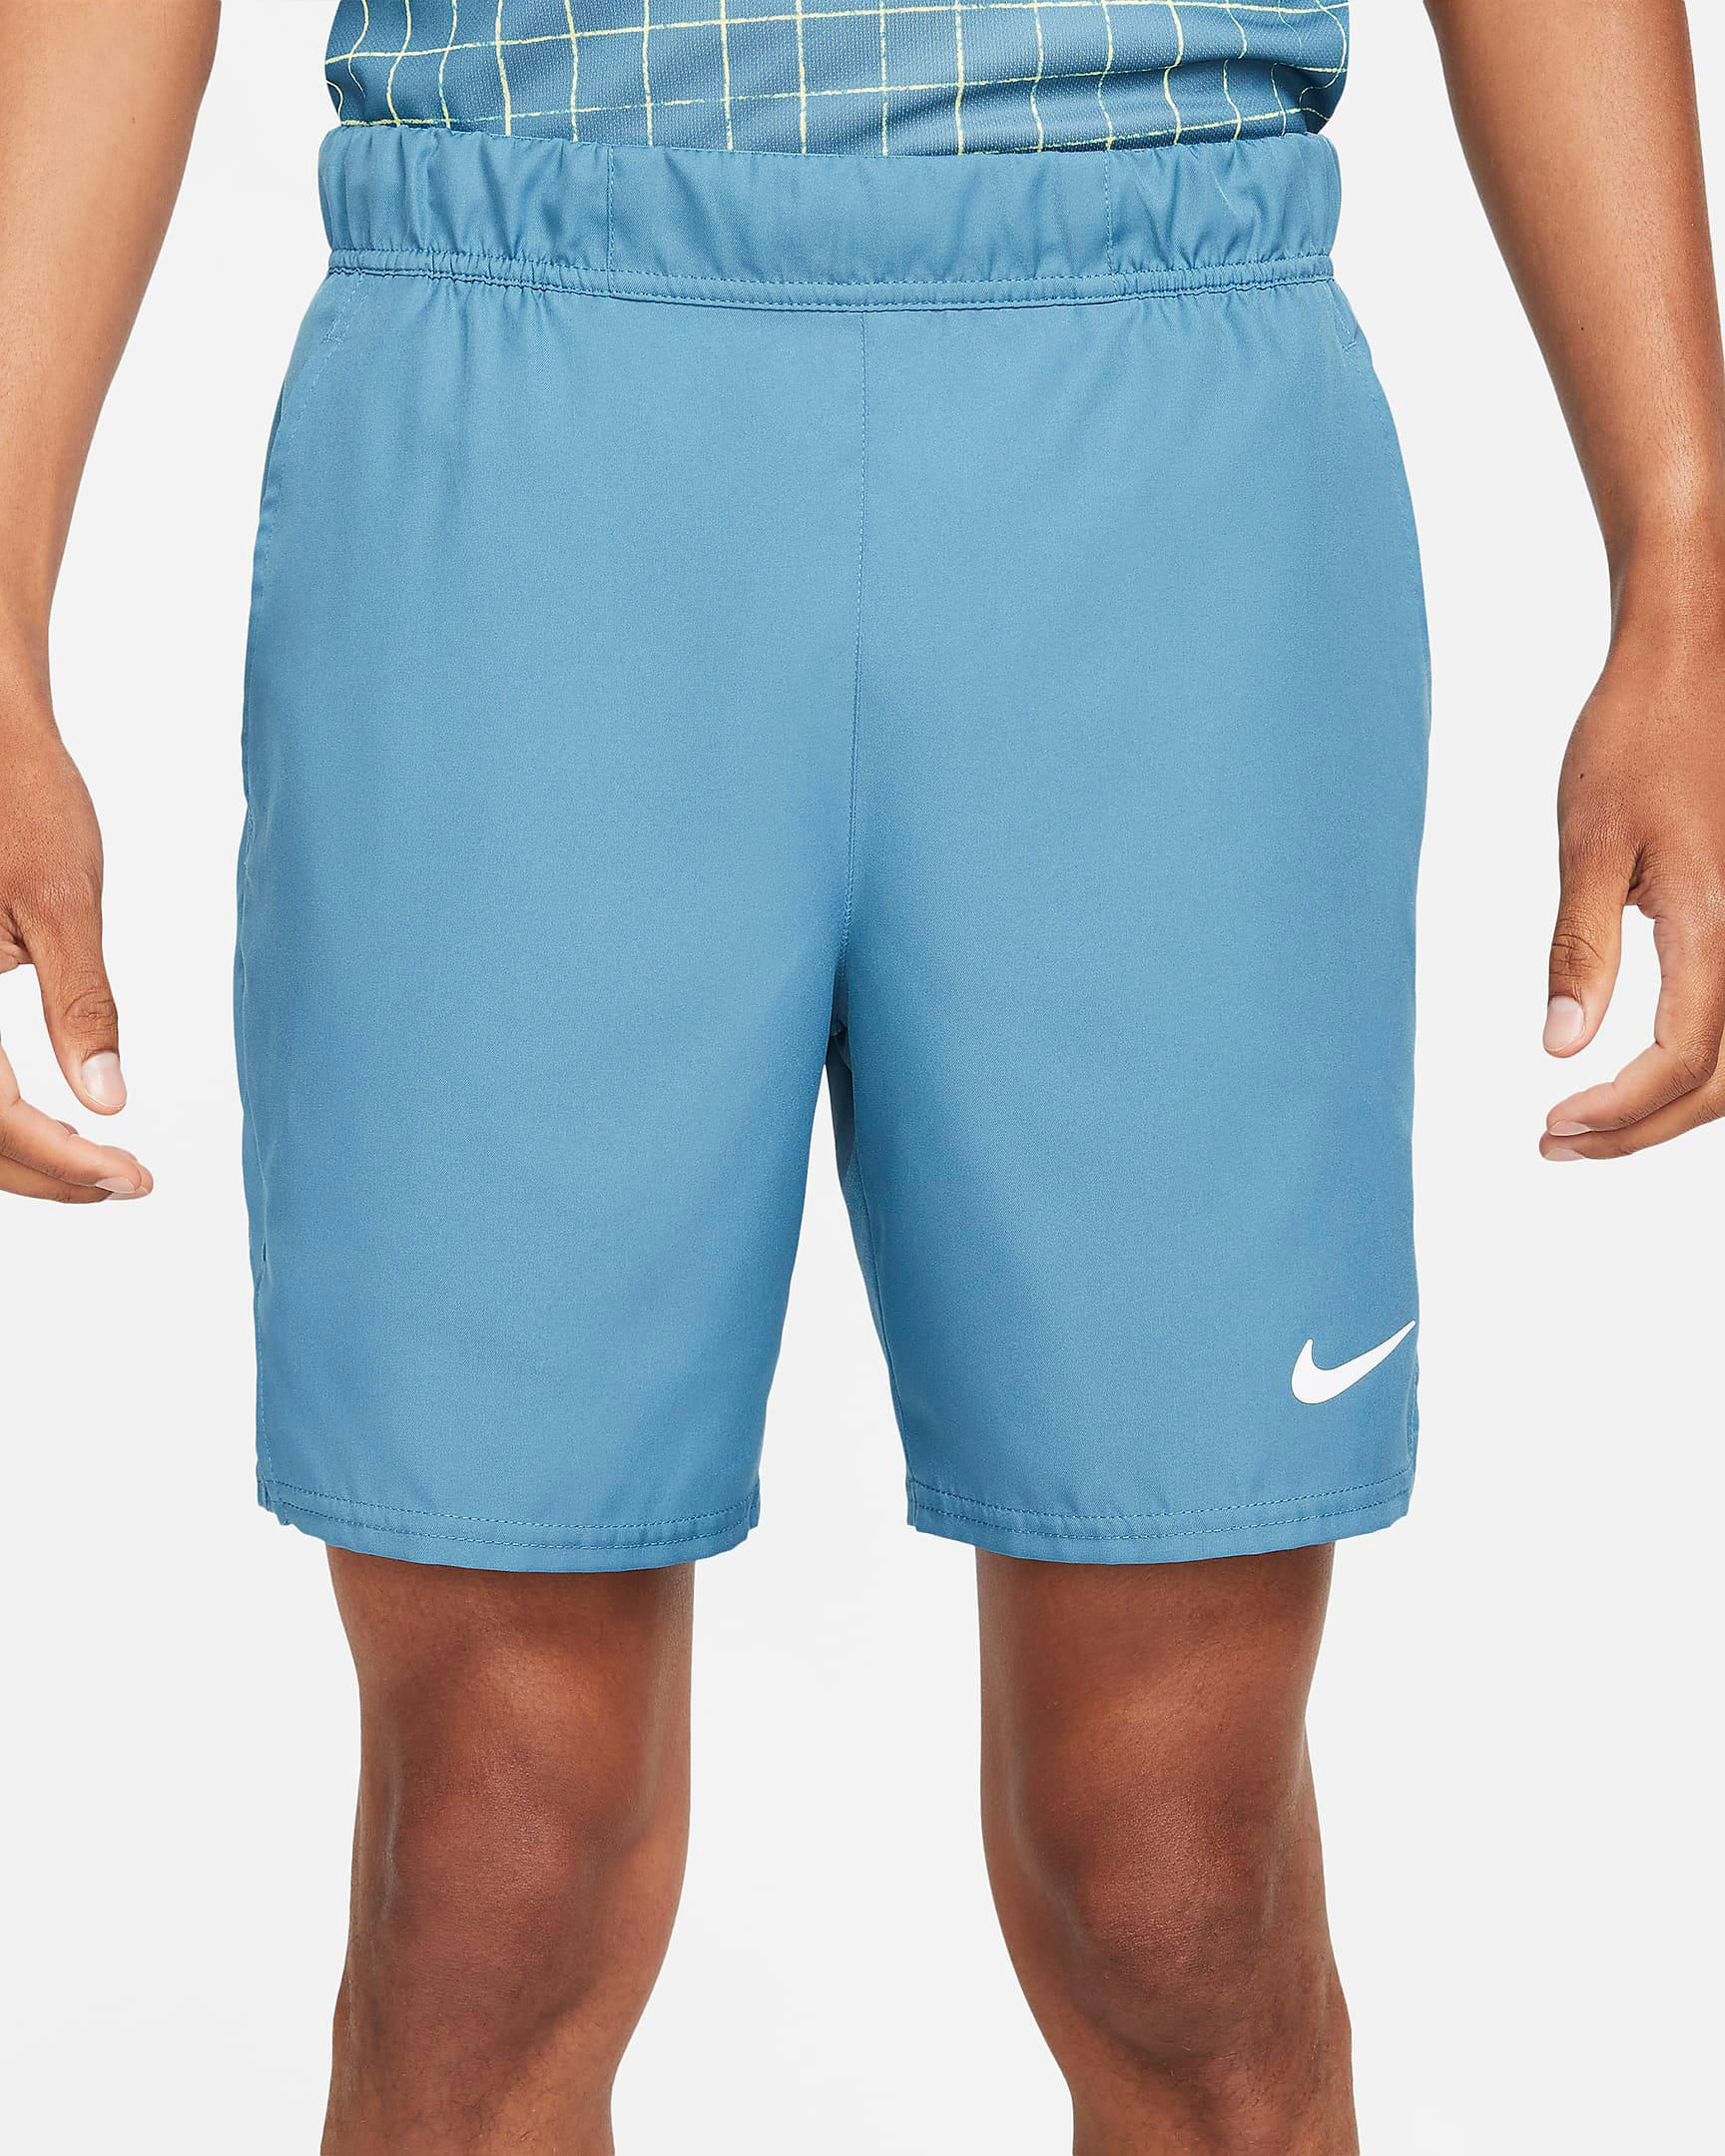 nike-rift-blue-shorts